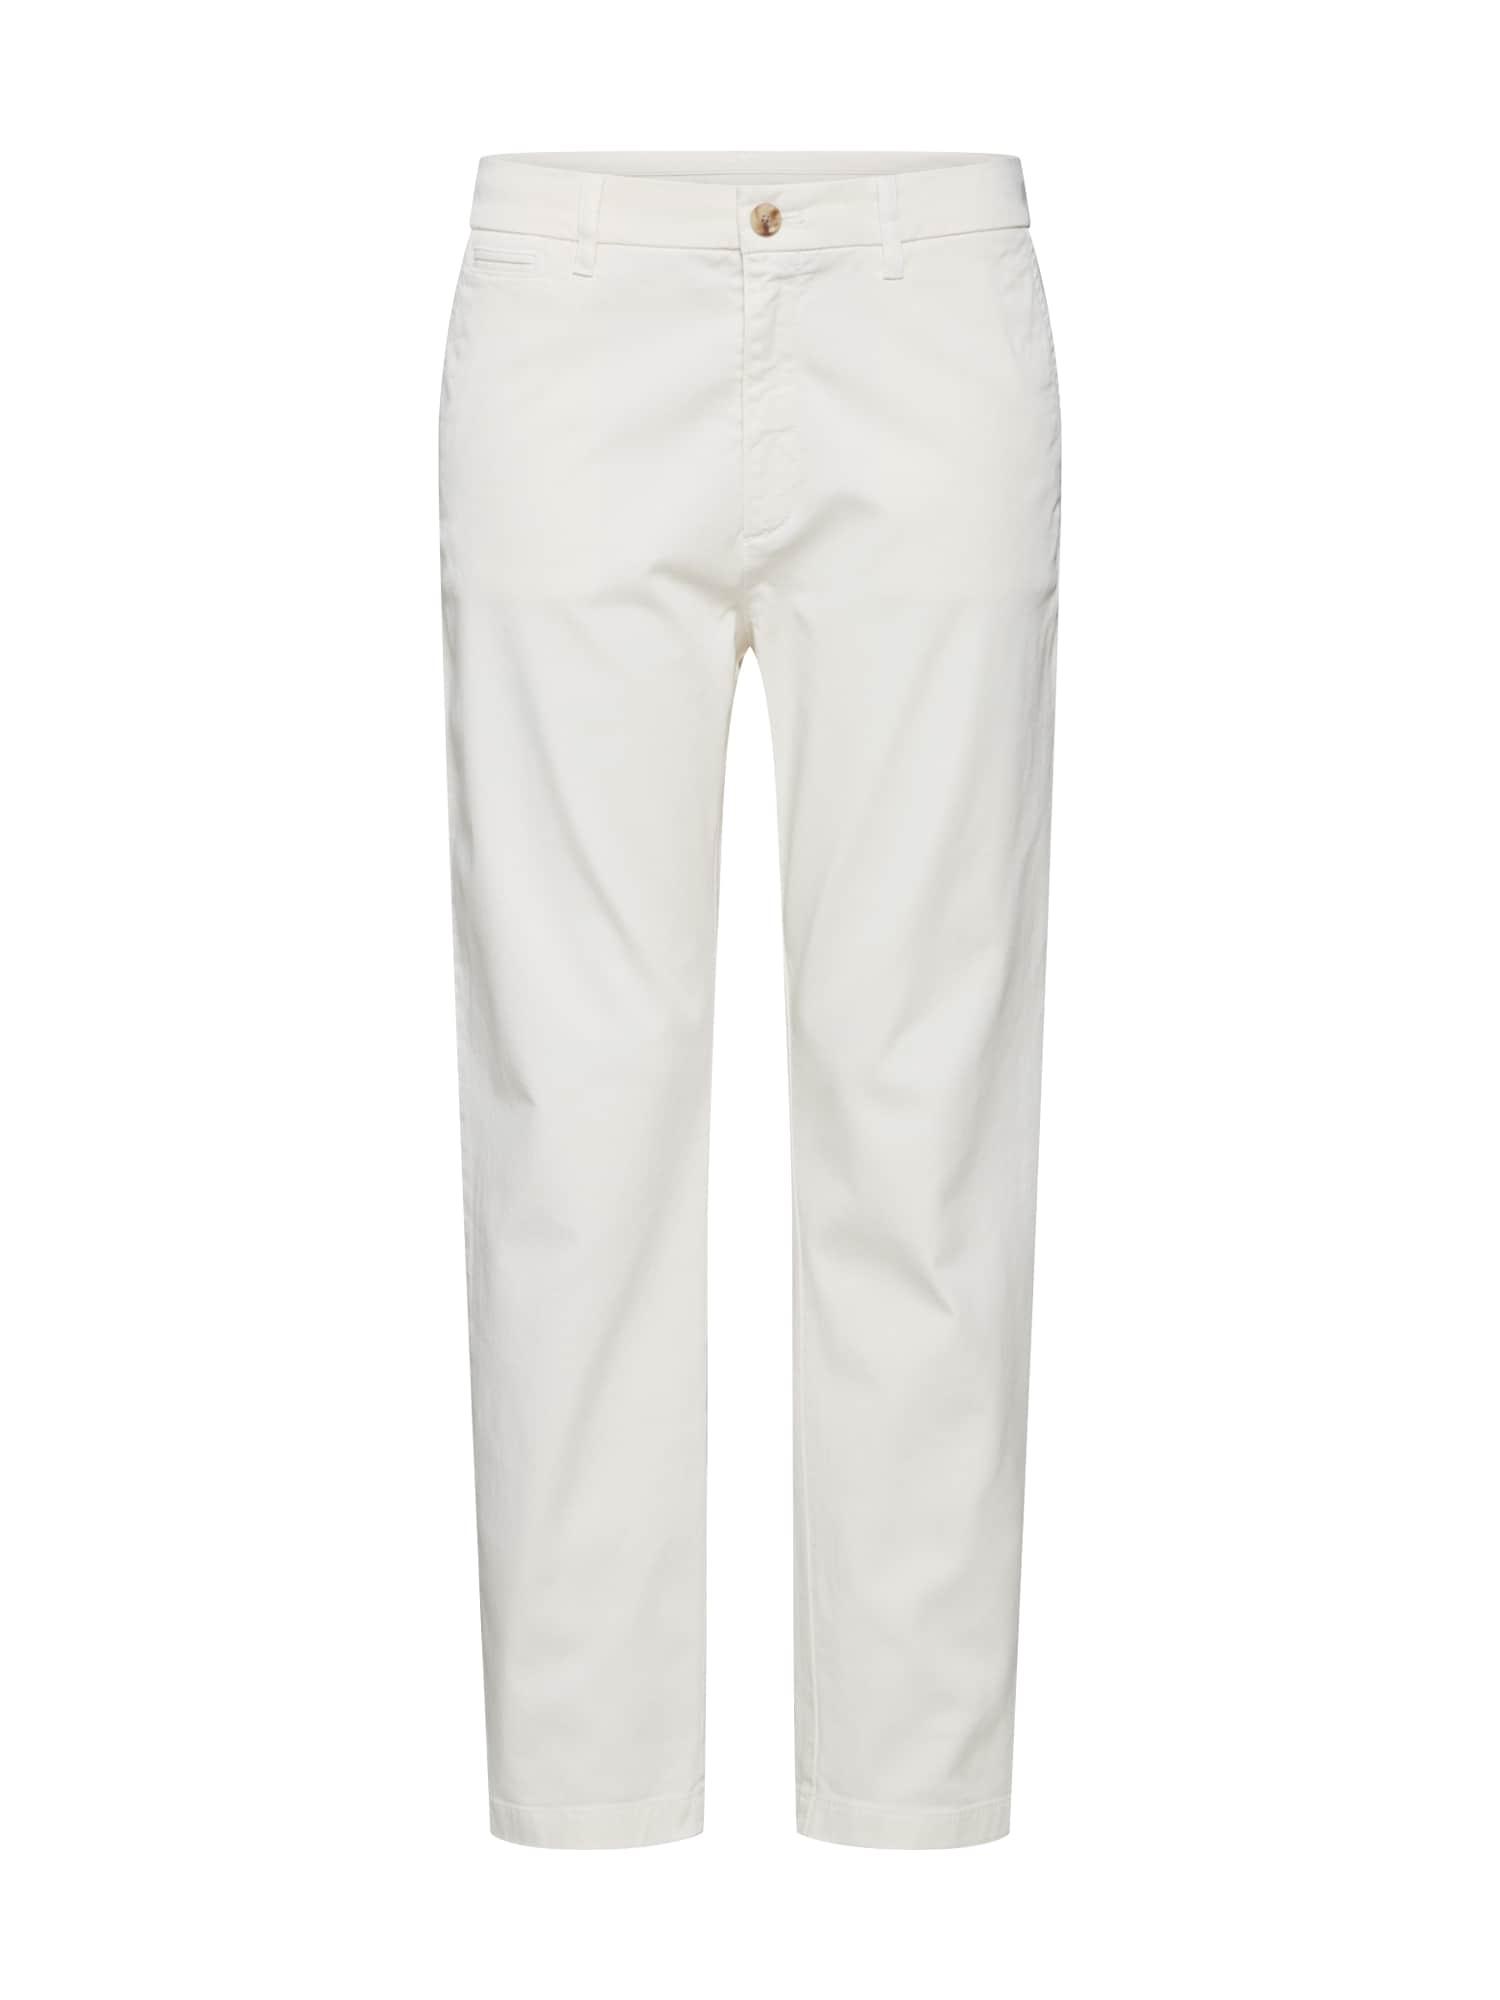 BOSS Chino stiliaus kelnės 'Solga-D' balta